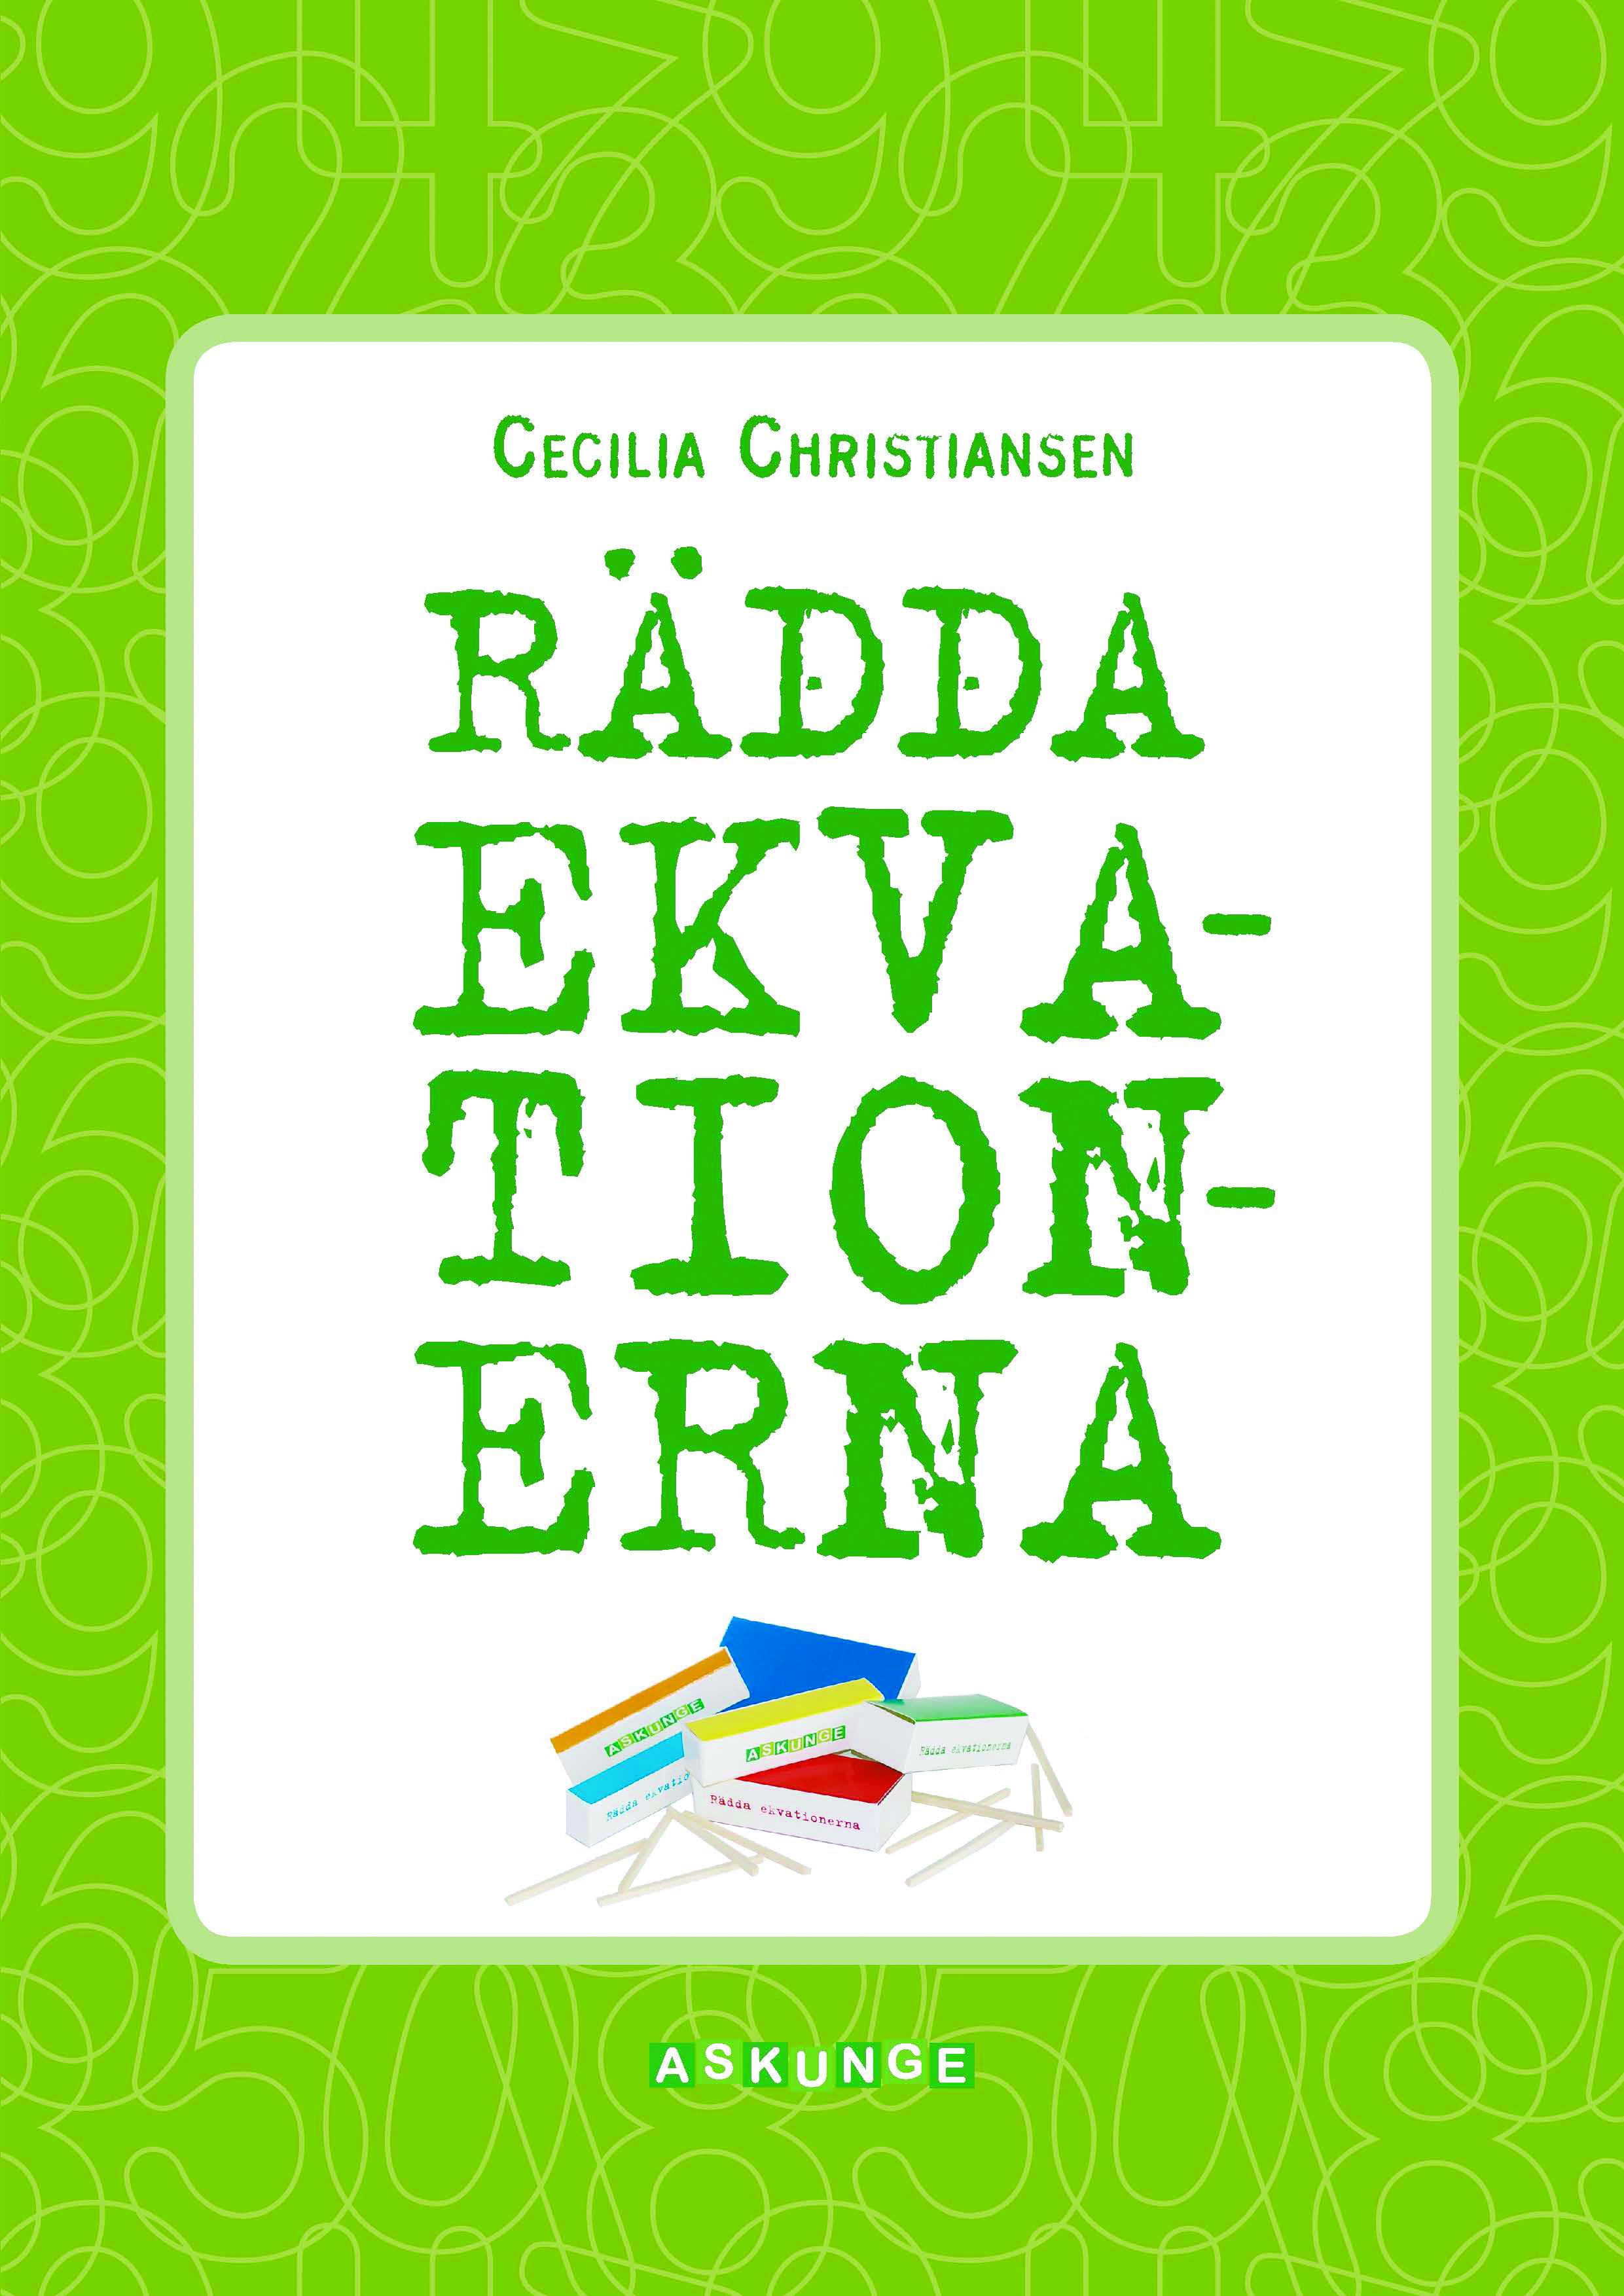 Rädda ekvationerna Grön